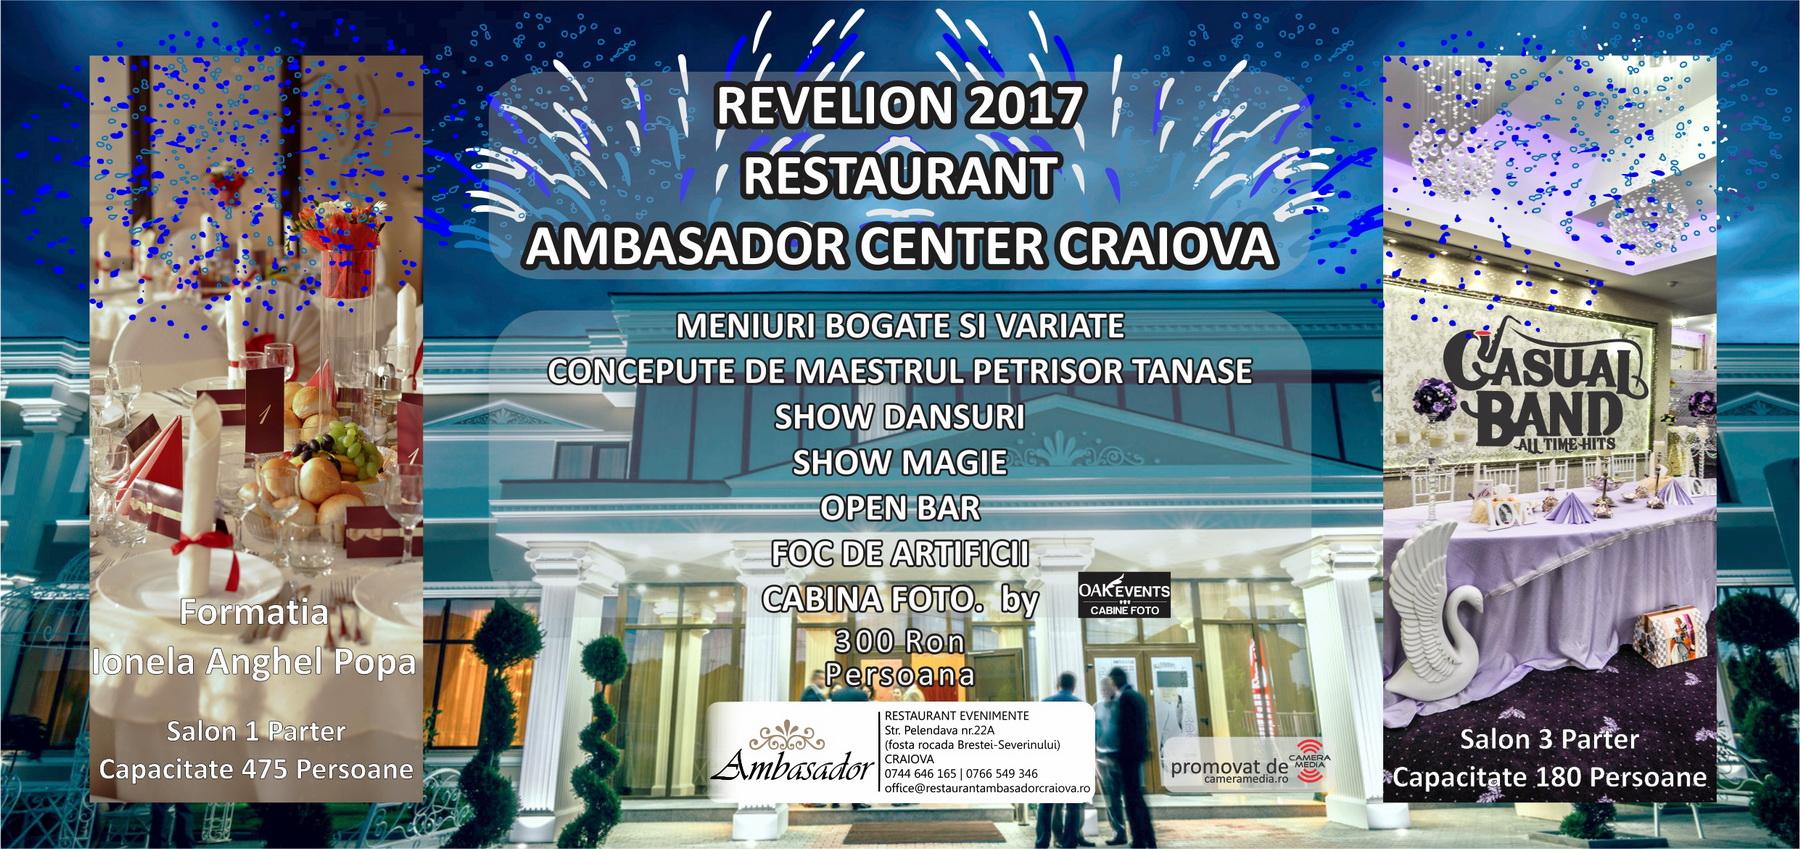 Meniu Revelion 2017 Craiova | Restaurant Nunta, Botez, Corporate, Evenimente Craiova | Ambasador Center Craiova